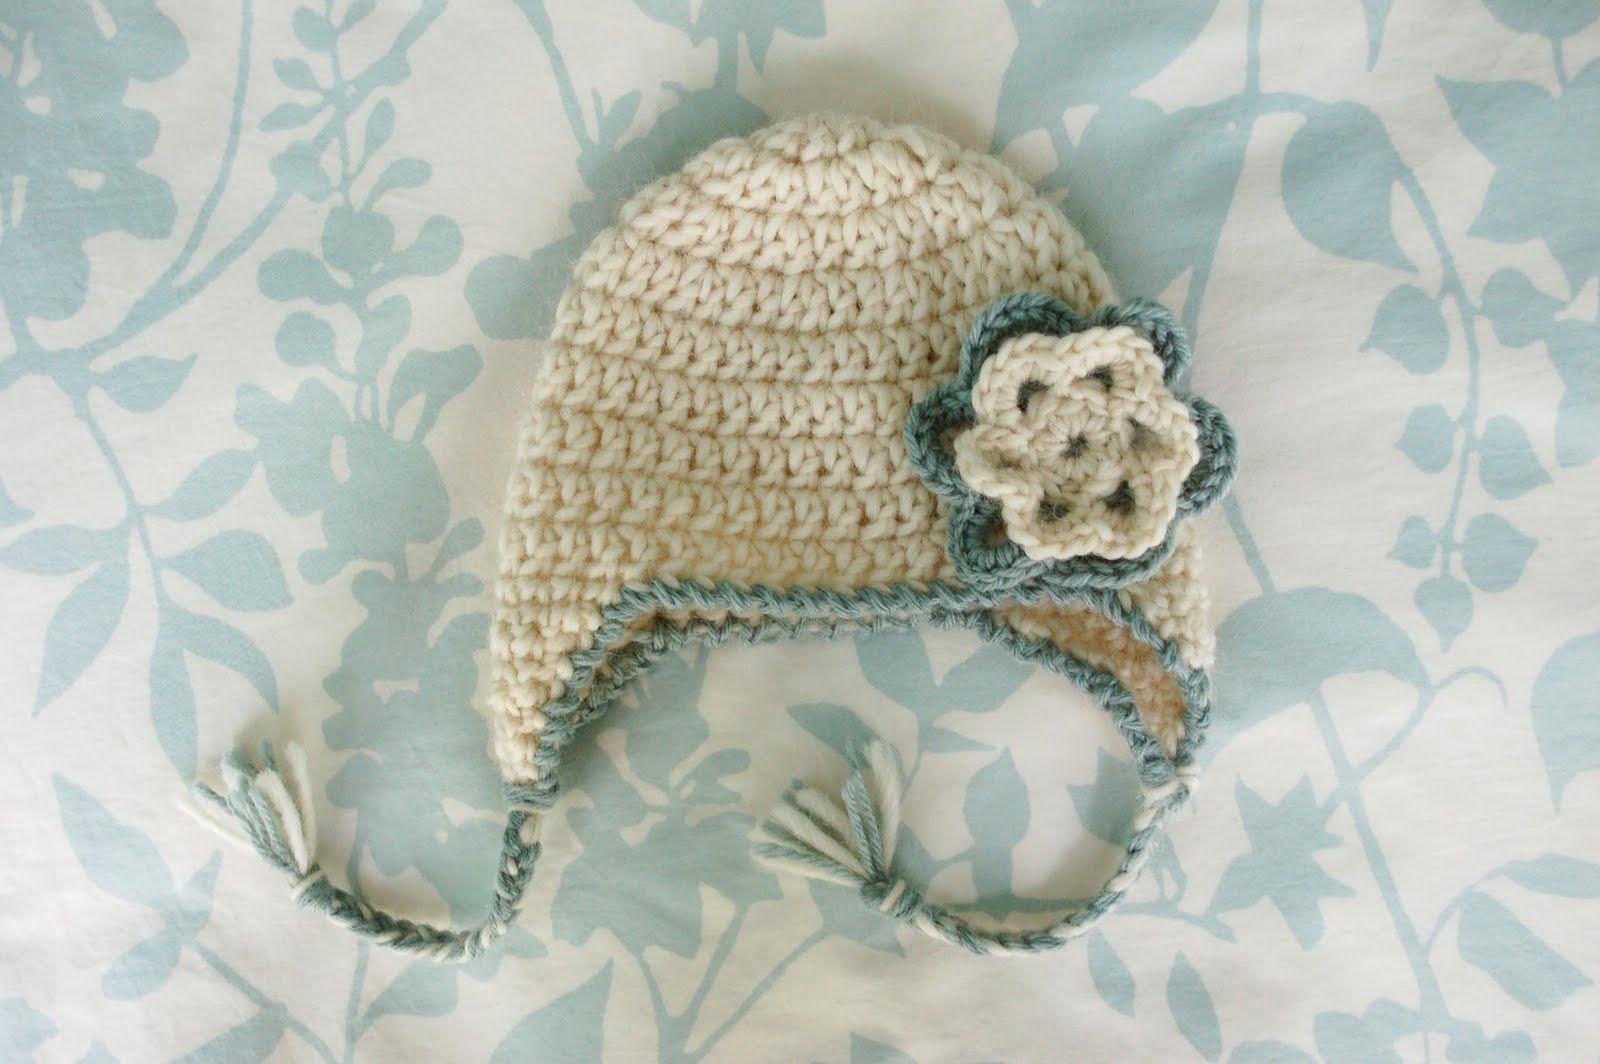 Alli Crafts: Free Pattern: Baby Earflap Hat - Newborn | Crochet ...